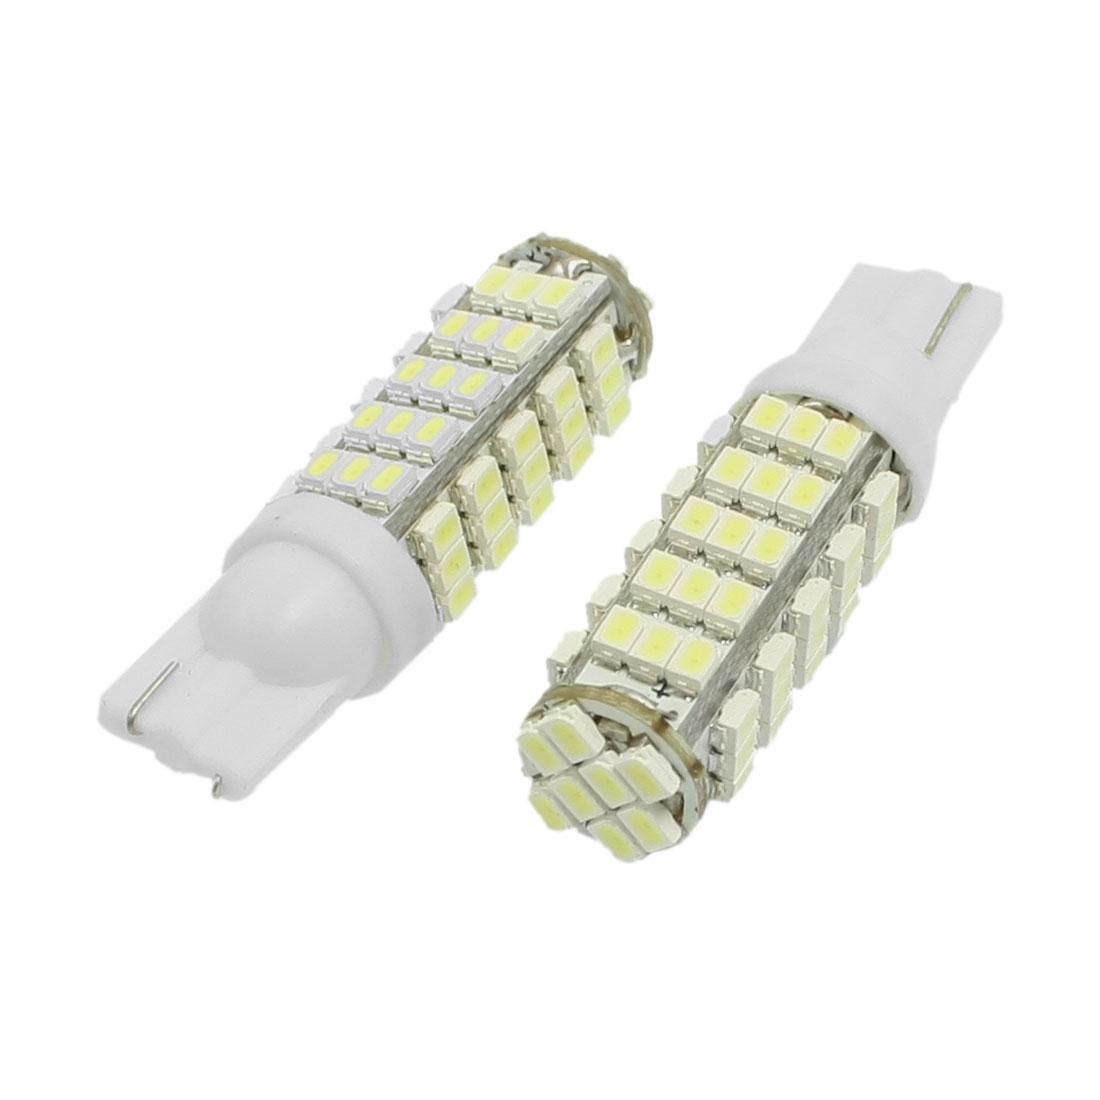 2 Pcs T10 Car White 1206 SMD 68 LED Inverted Side Wedge Light Bulbs